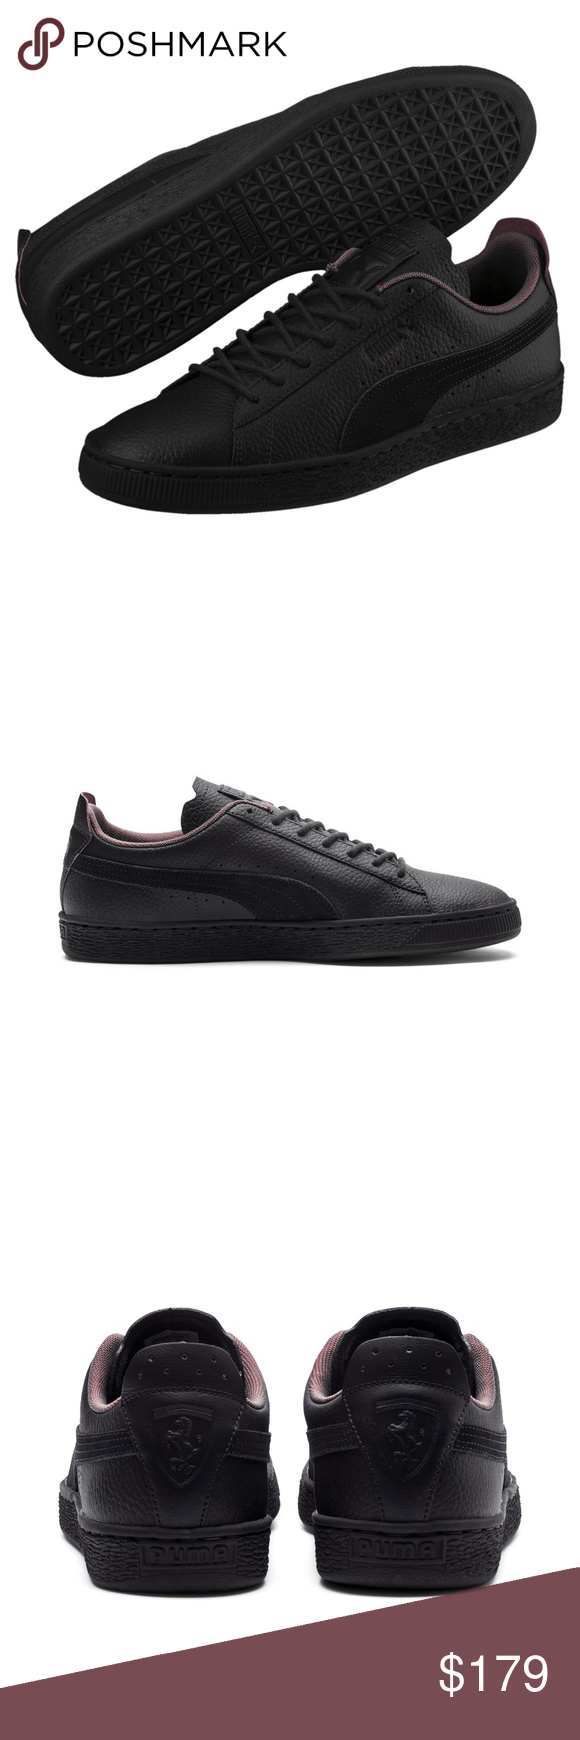 PUMA Scuderia Ferrari Basket Sneakers Men Shoes PUMA